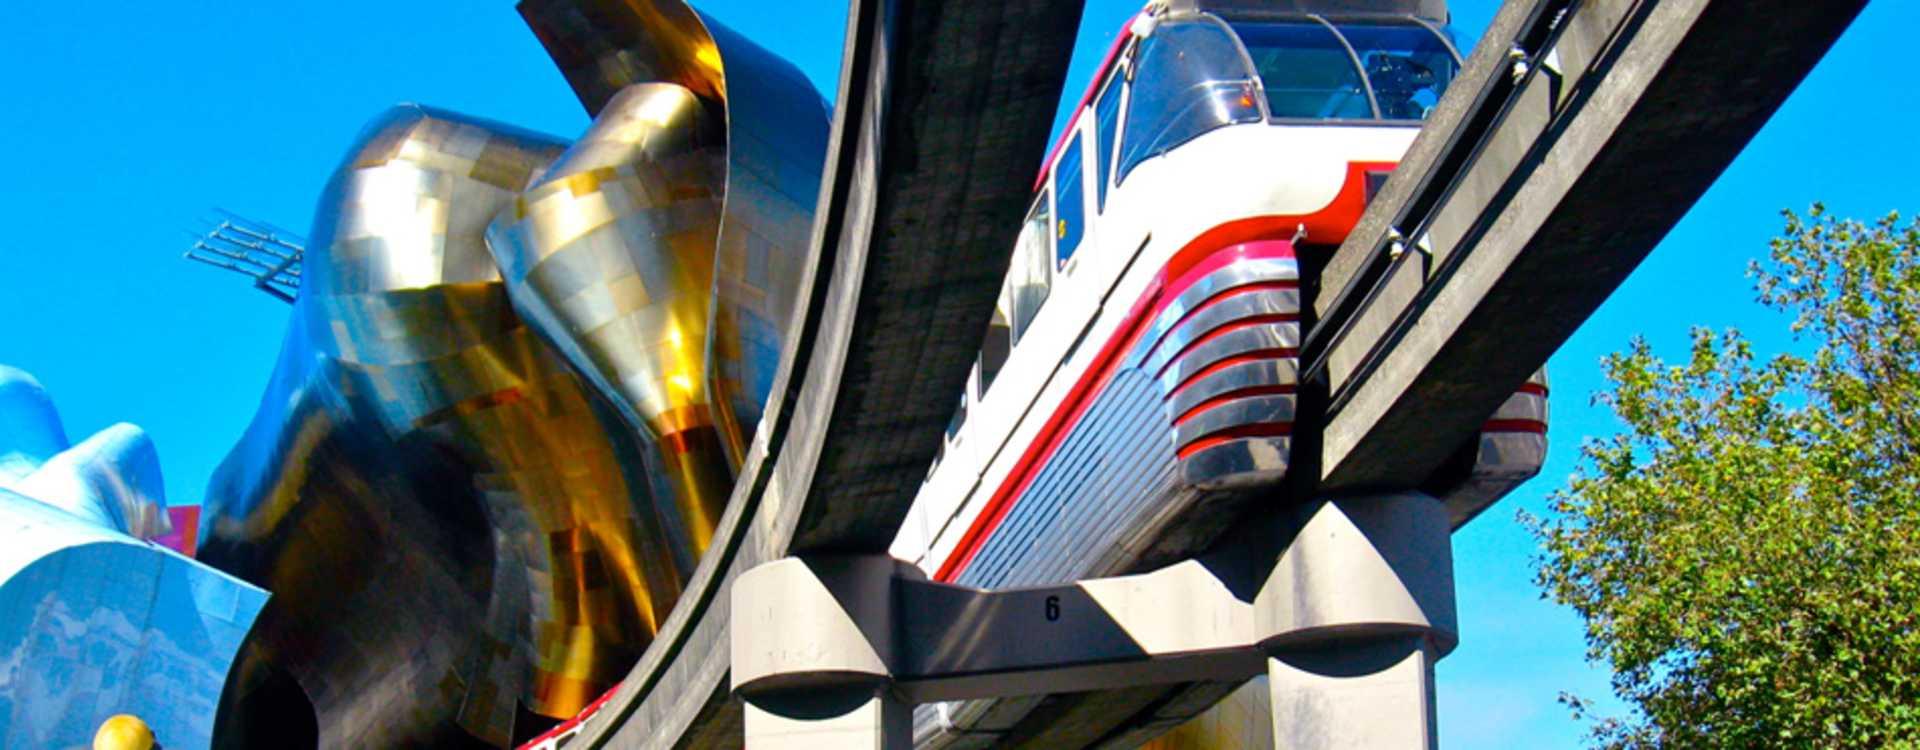 Seattle_Monorail.jpg